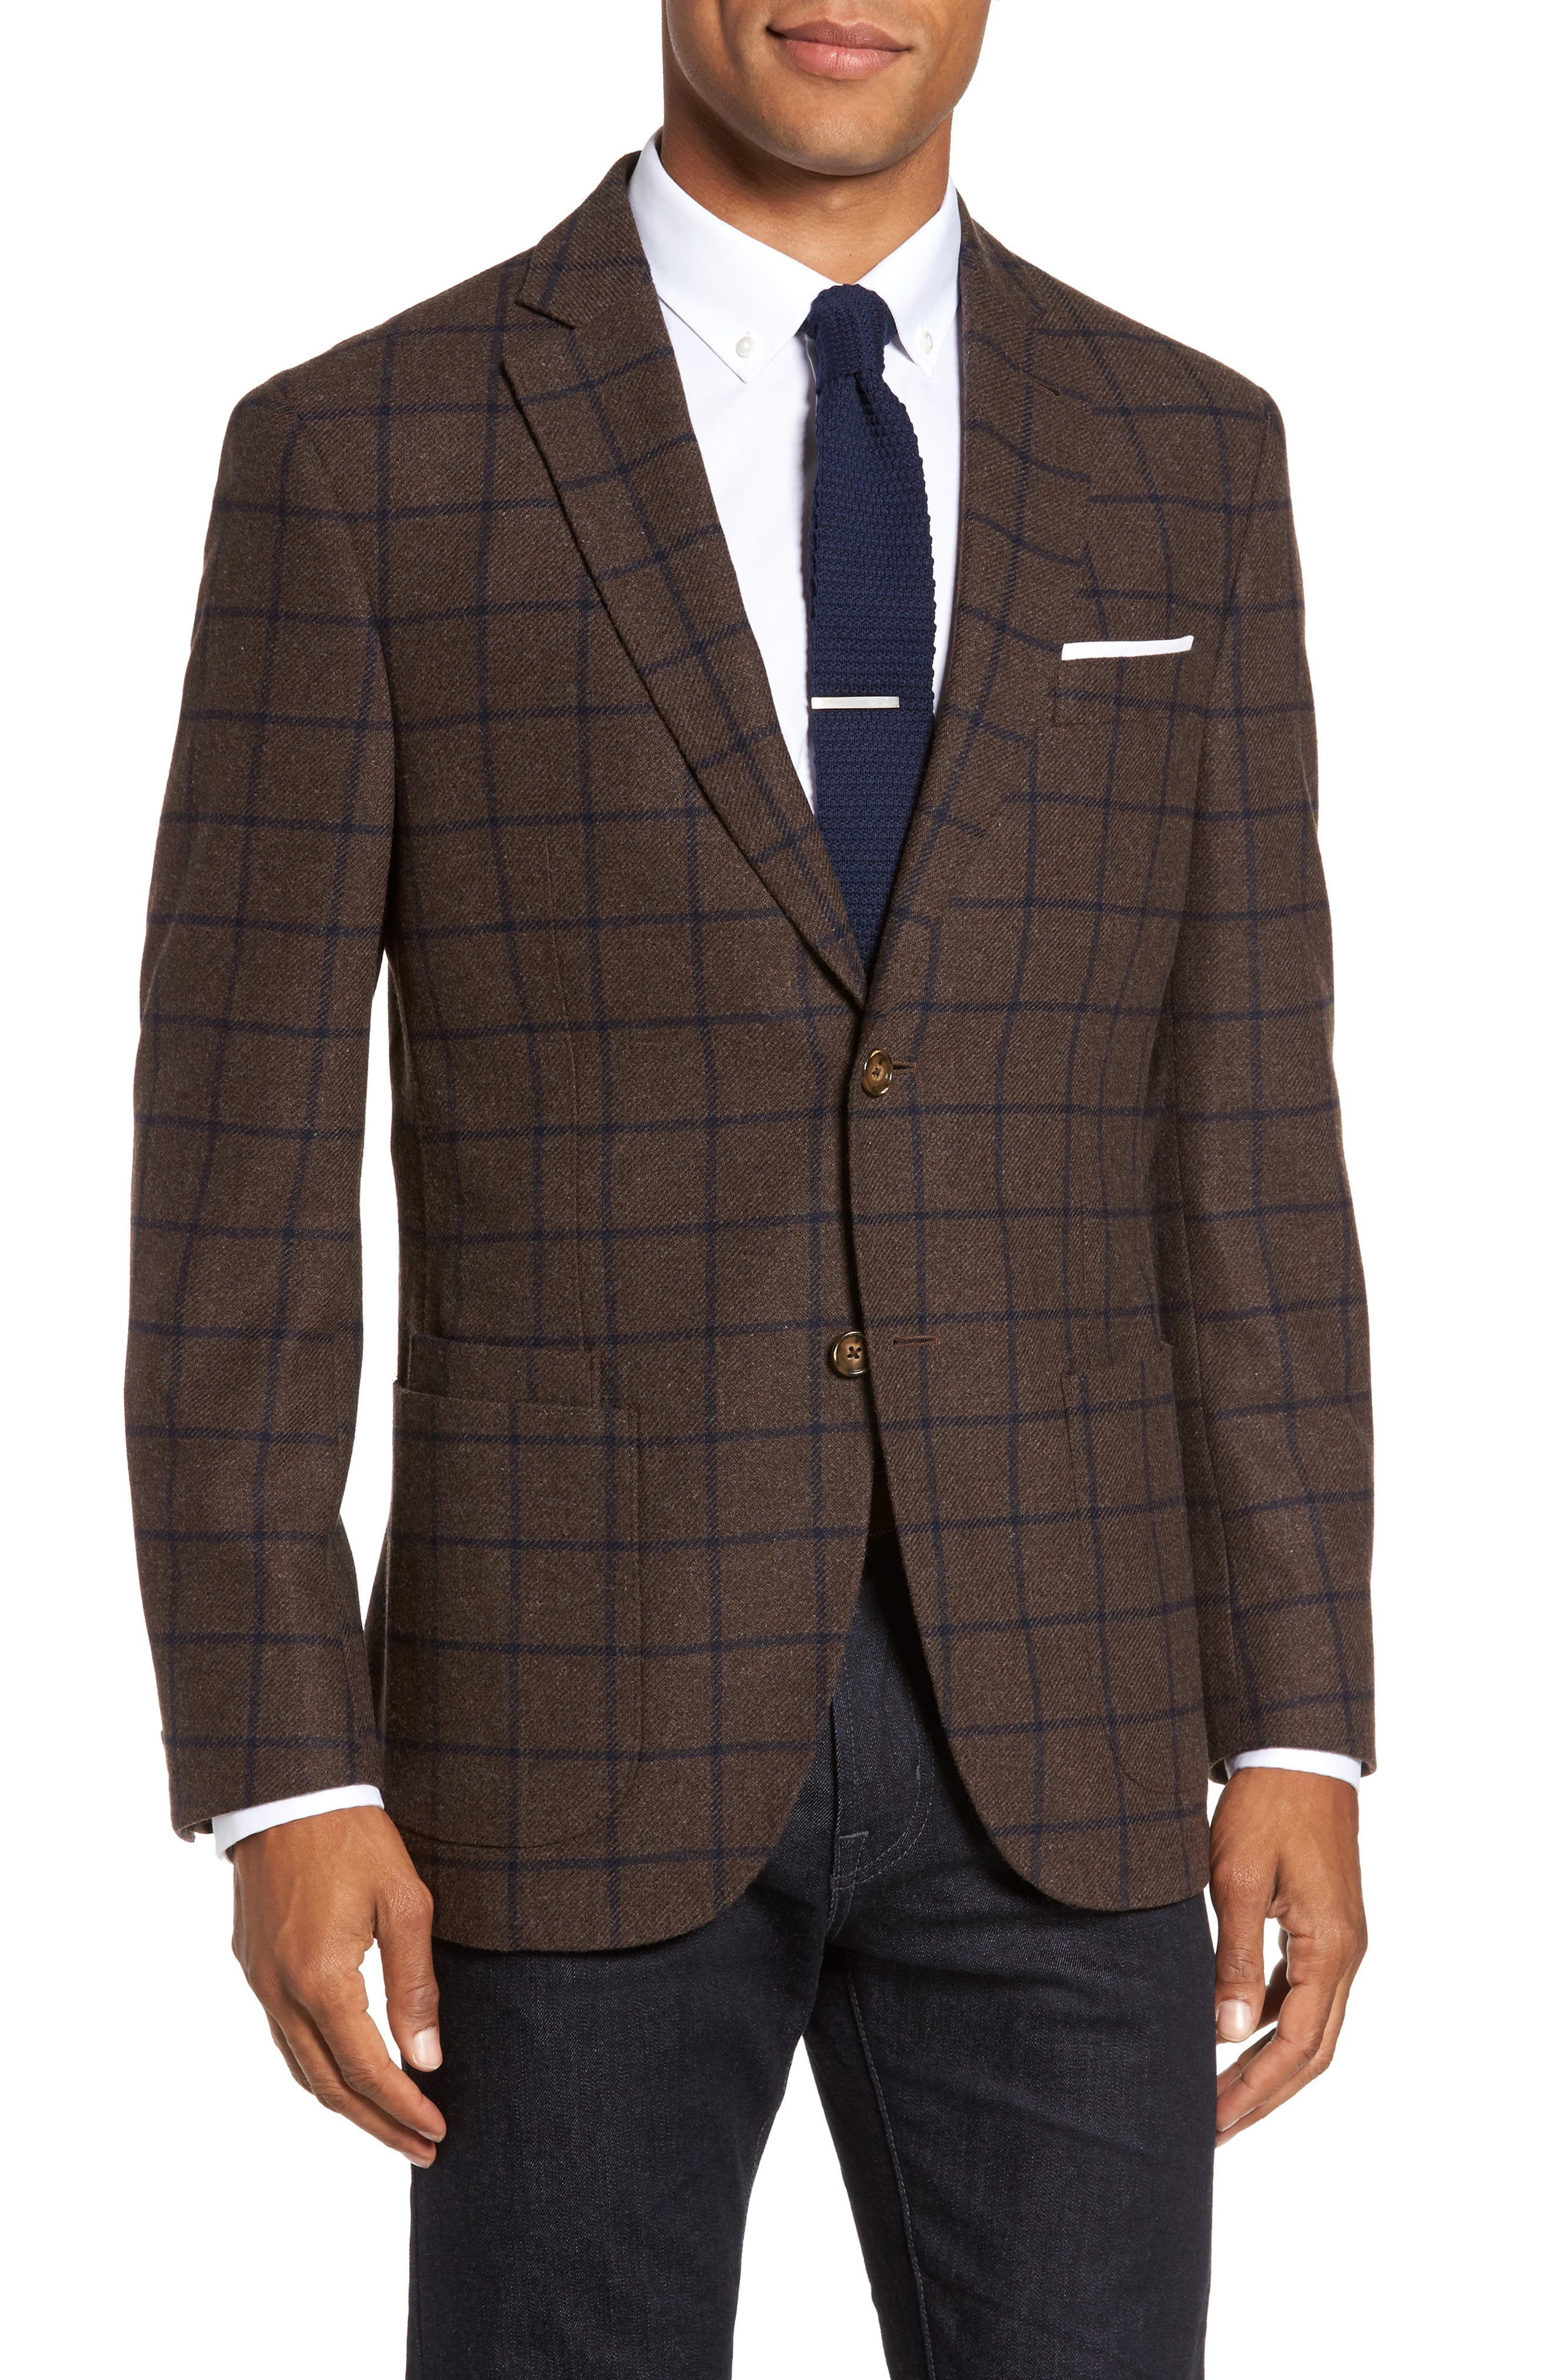 Alternate Image 1 Selected - JKT New York Trim Fit Windowpane Wool Blend Sport Coat